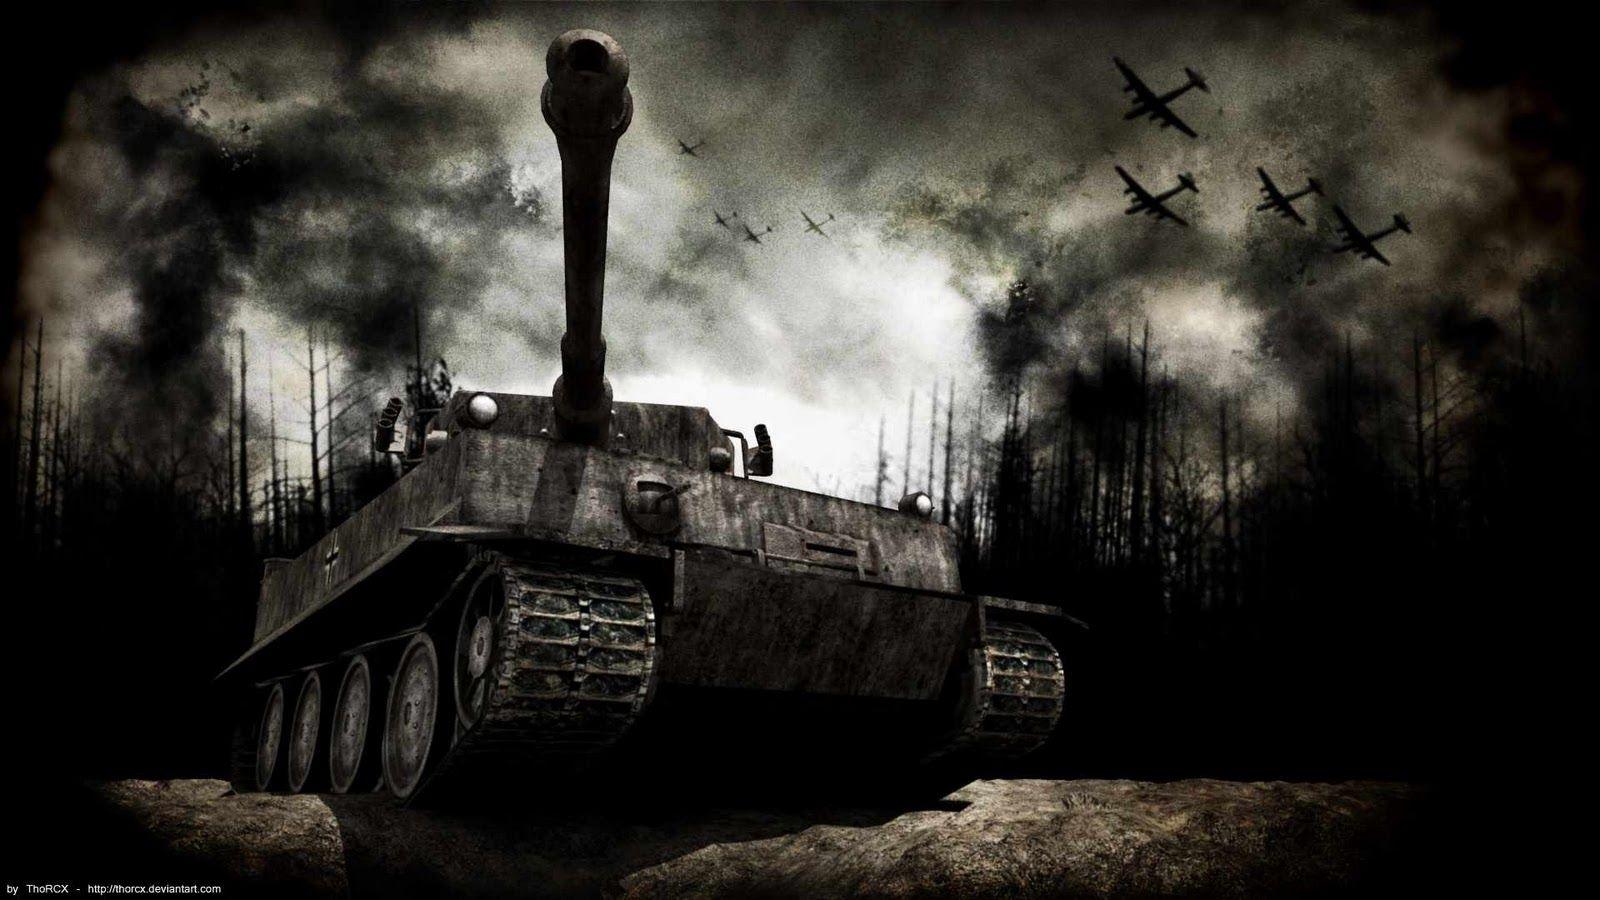 ww2 german army wallpaper - photo #12